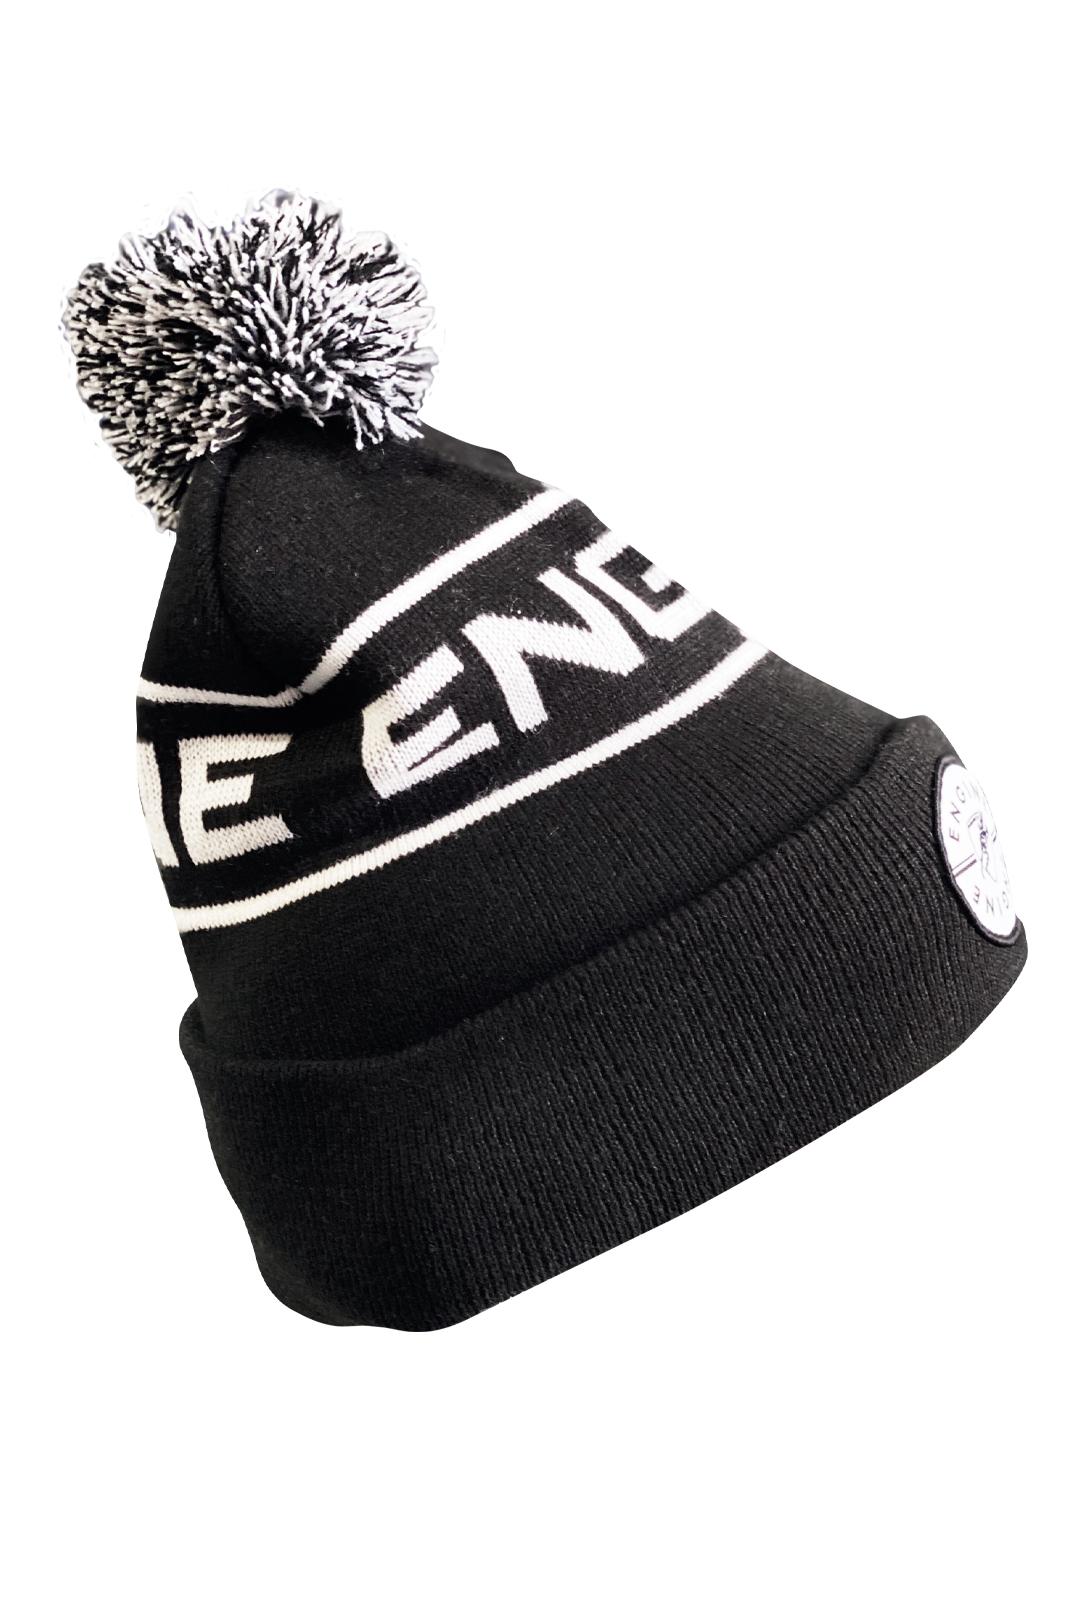 Beanie - Black & White